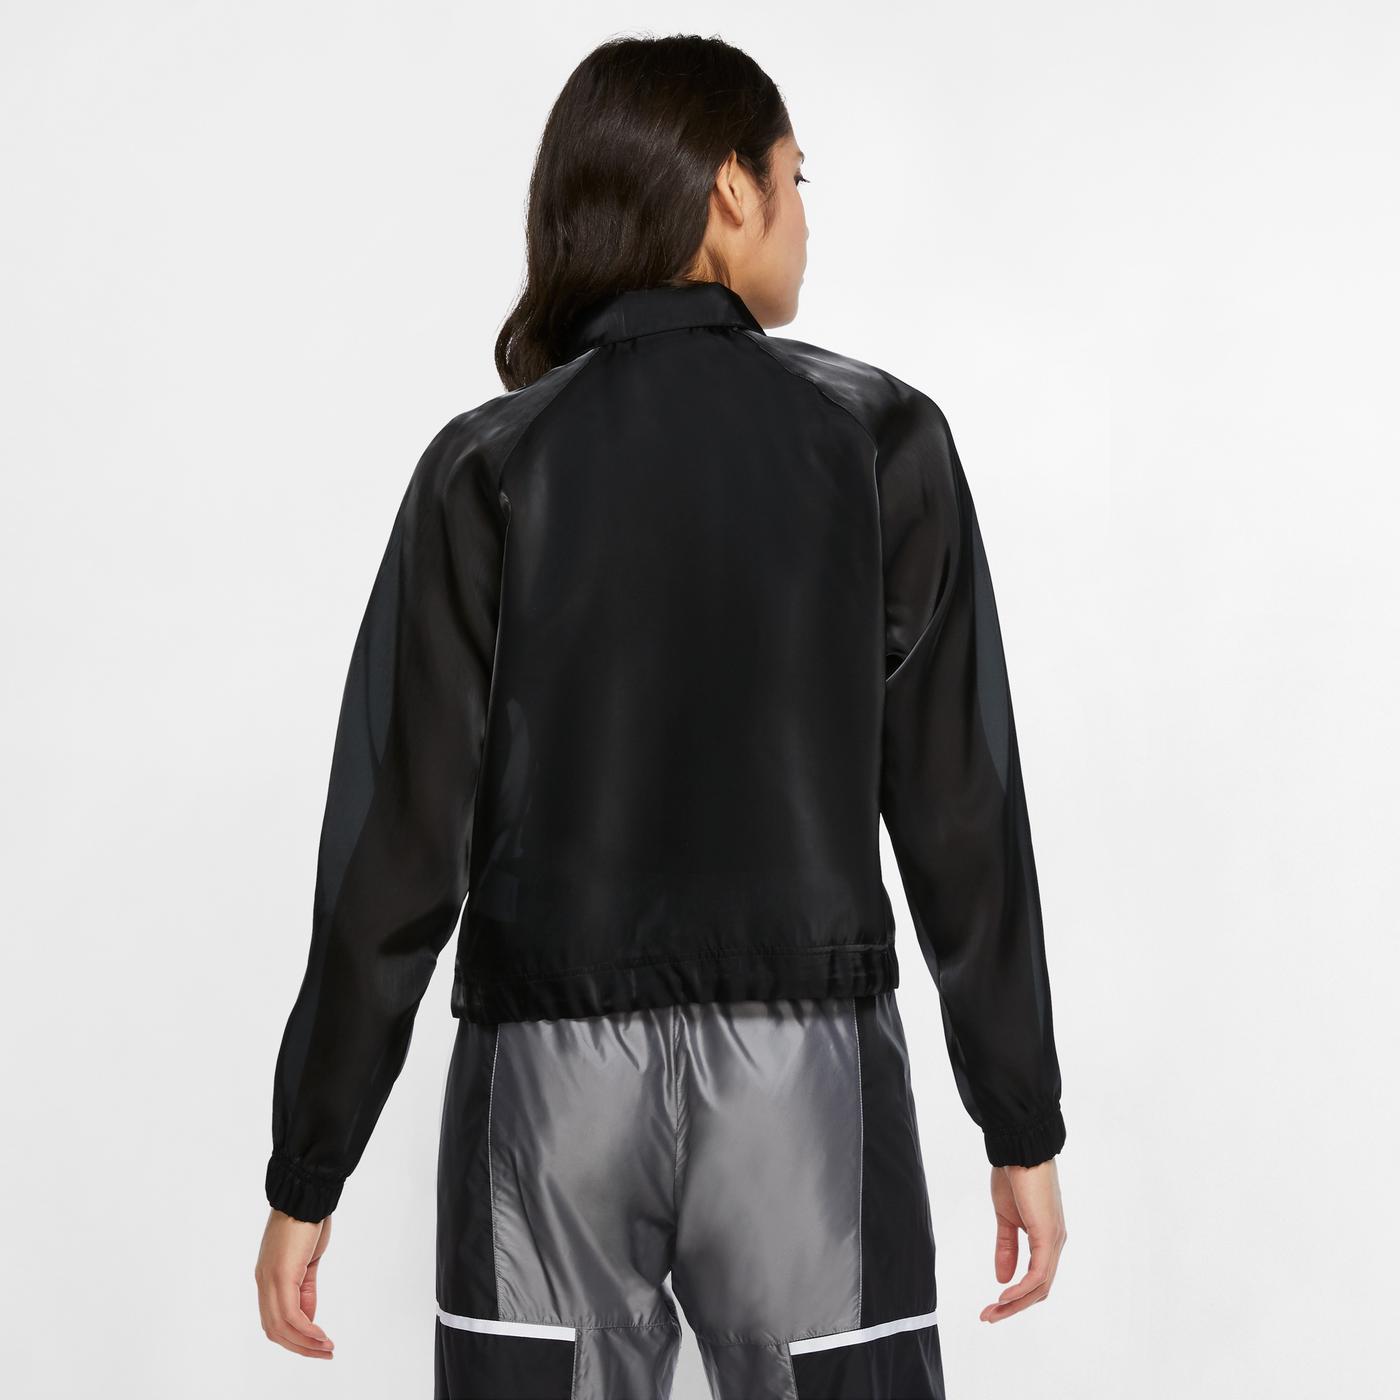 Nike Sportswear Air Kadın Siyah Eşofman Üstü